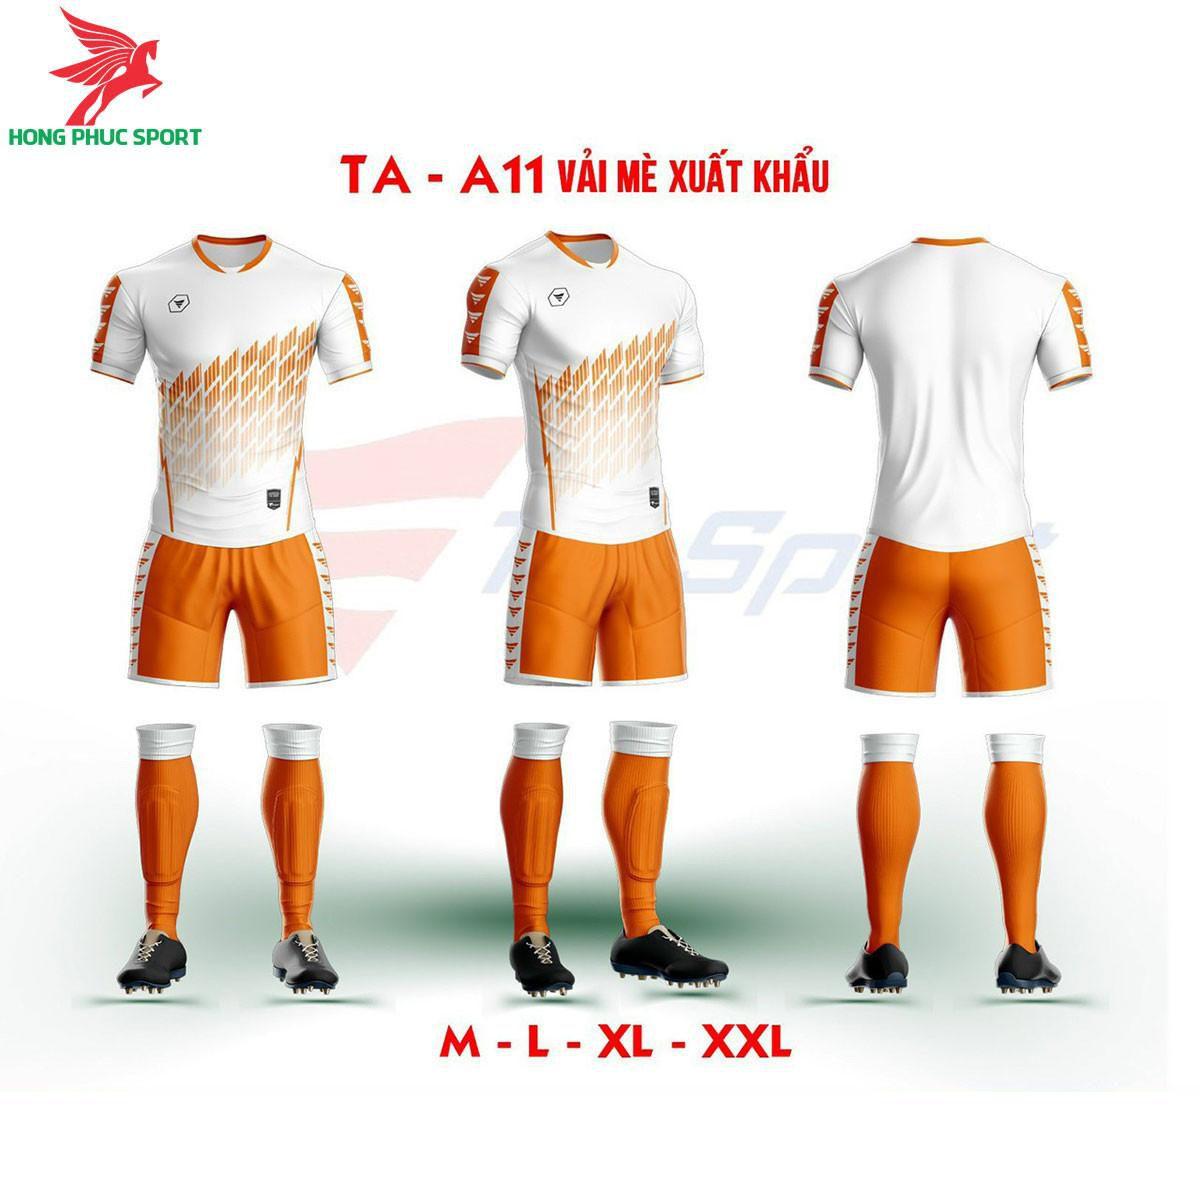 https://cdn.hongphucsport.com/unsafe/s4.shopbay.vn/files/285/ao-khong-logo-truong-an-ta-a11-mau-trang-605c69c0b6647.jpg